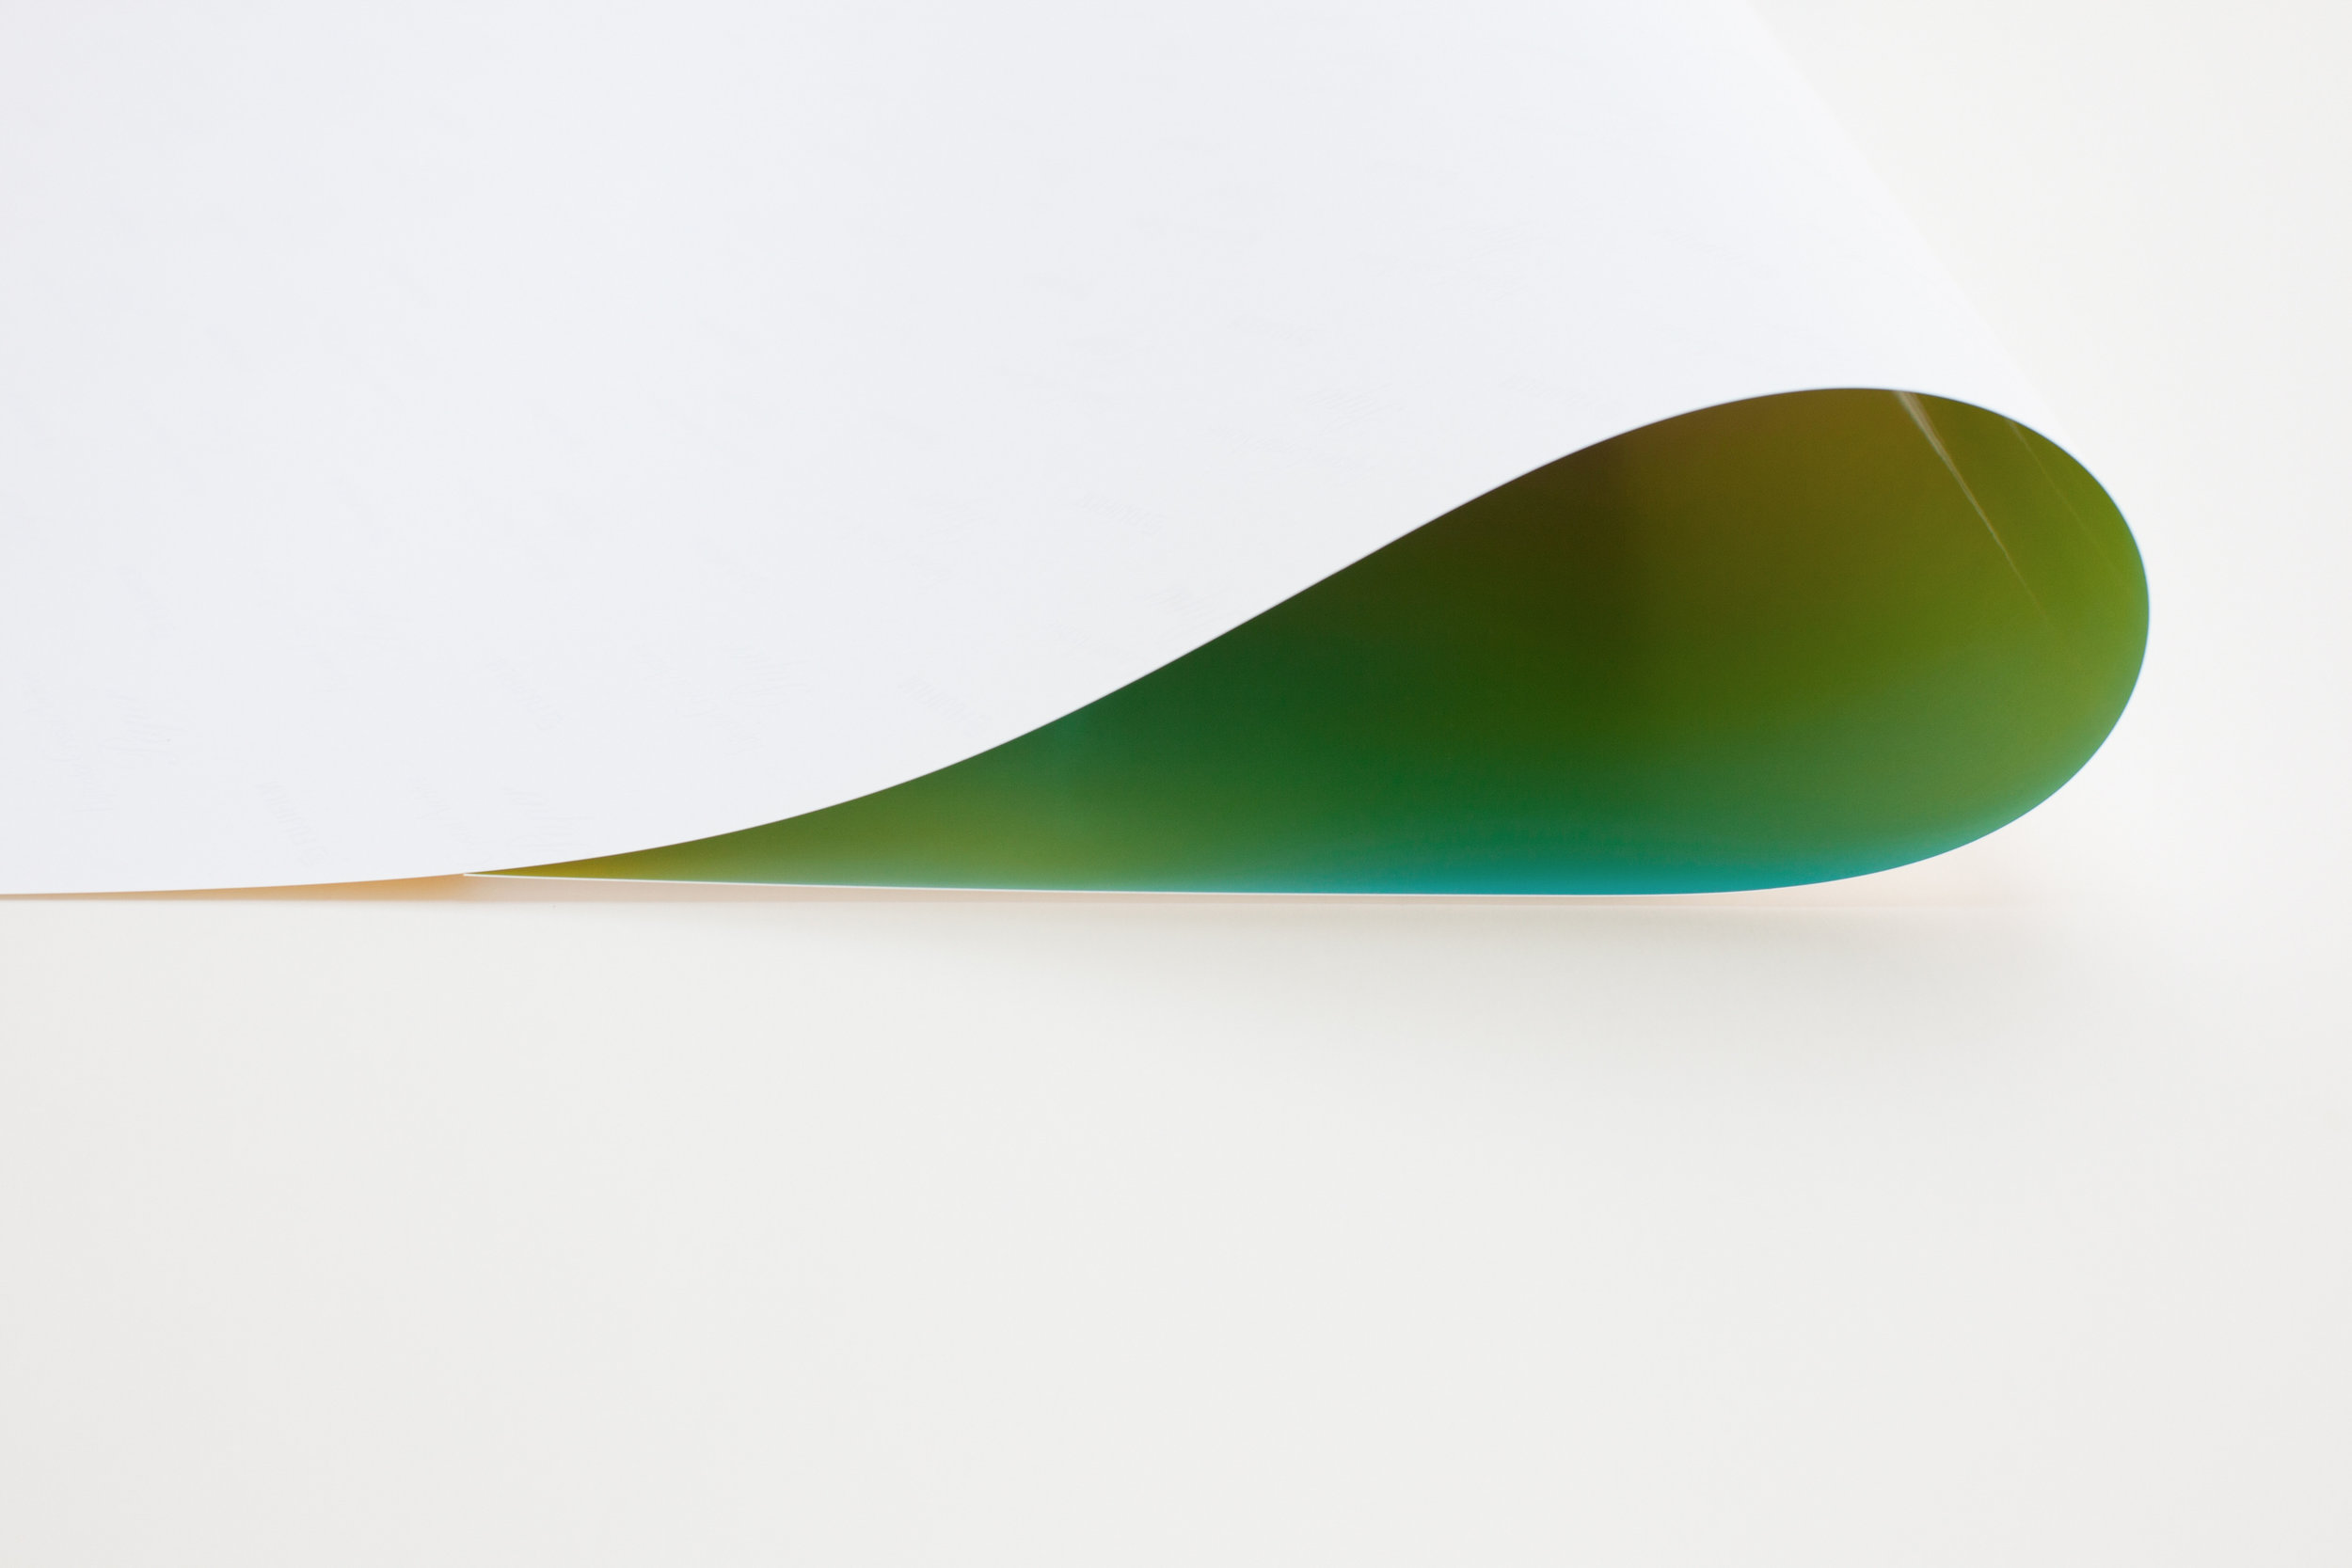 WOLFGANG TILMANS     Paper drop green II, 2011    Inkjet print on paper mounted on aluminium  74.4cm x 93cm